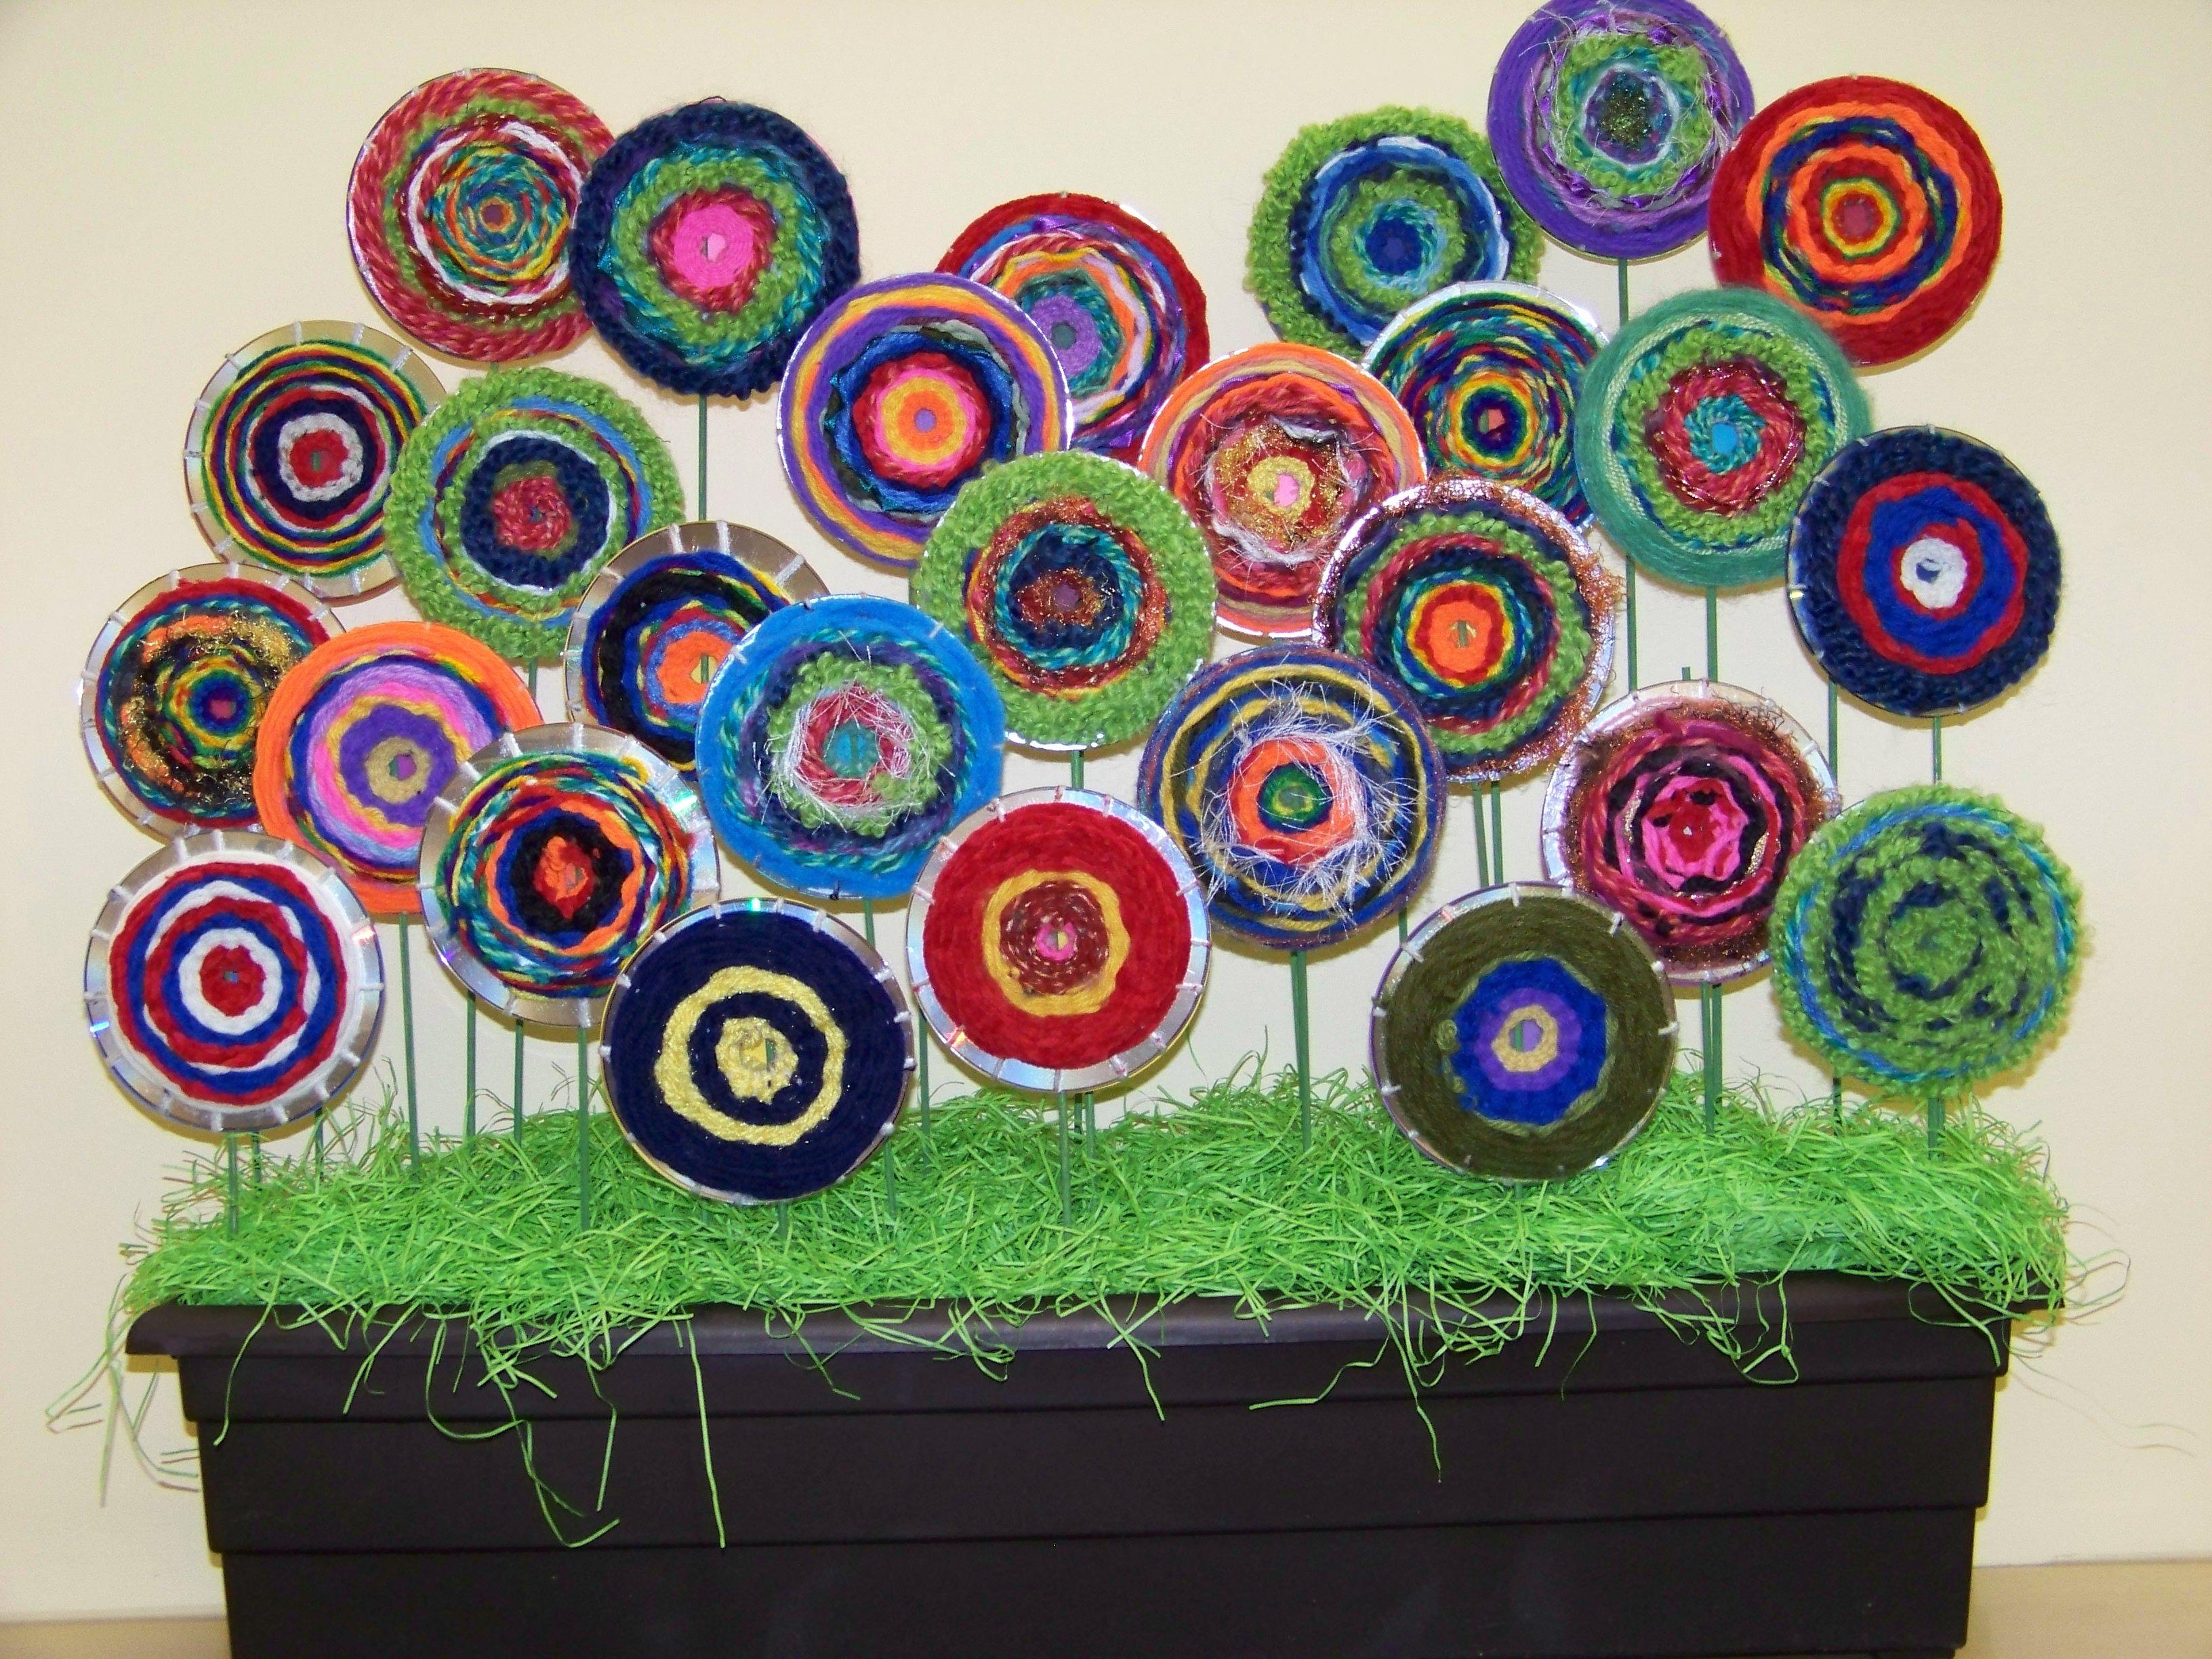 Homemade garden art ideas - 3rd Grade Group Art Woven Garden On Recycled Cd S